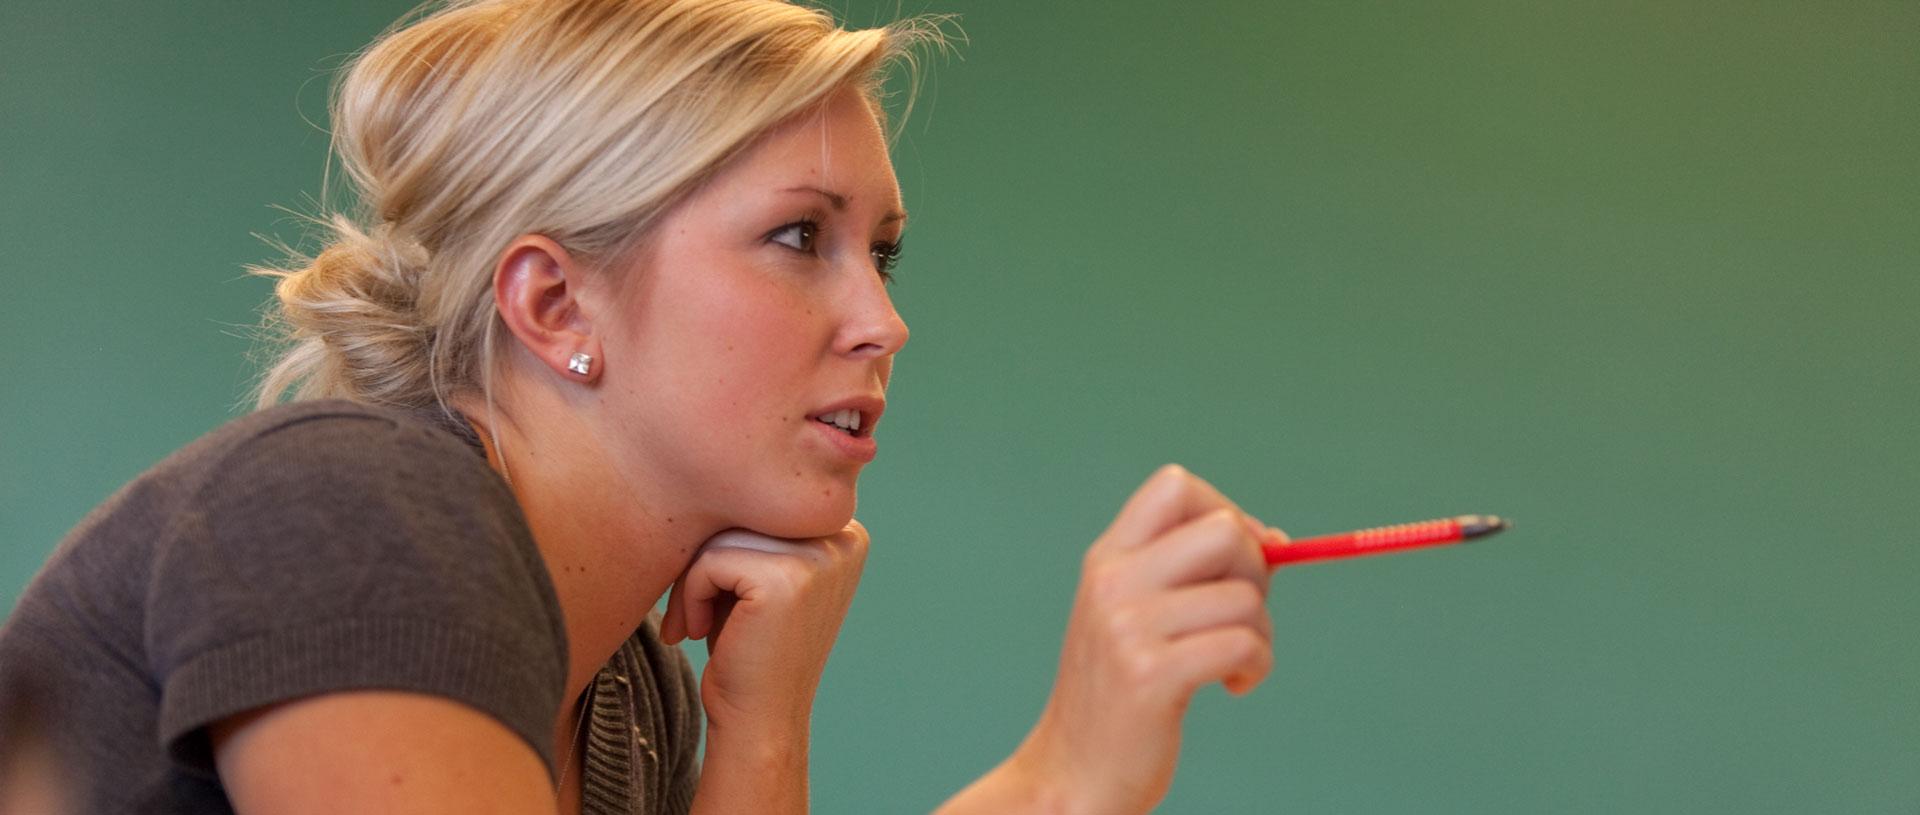 Female undergrad student engaging in class.